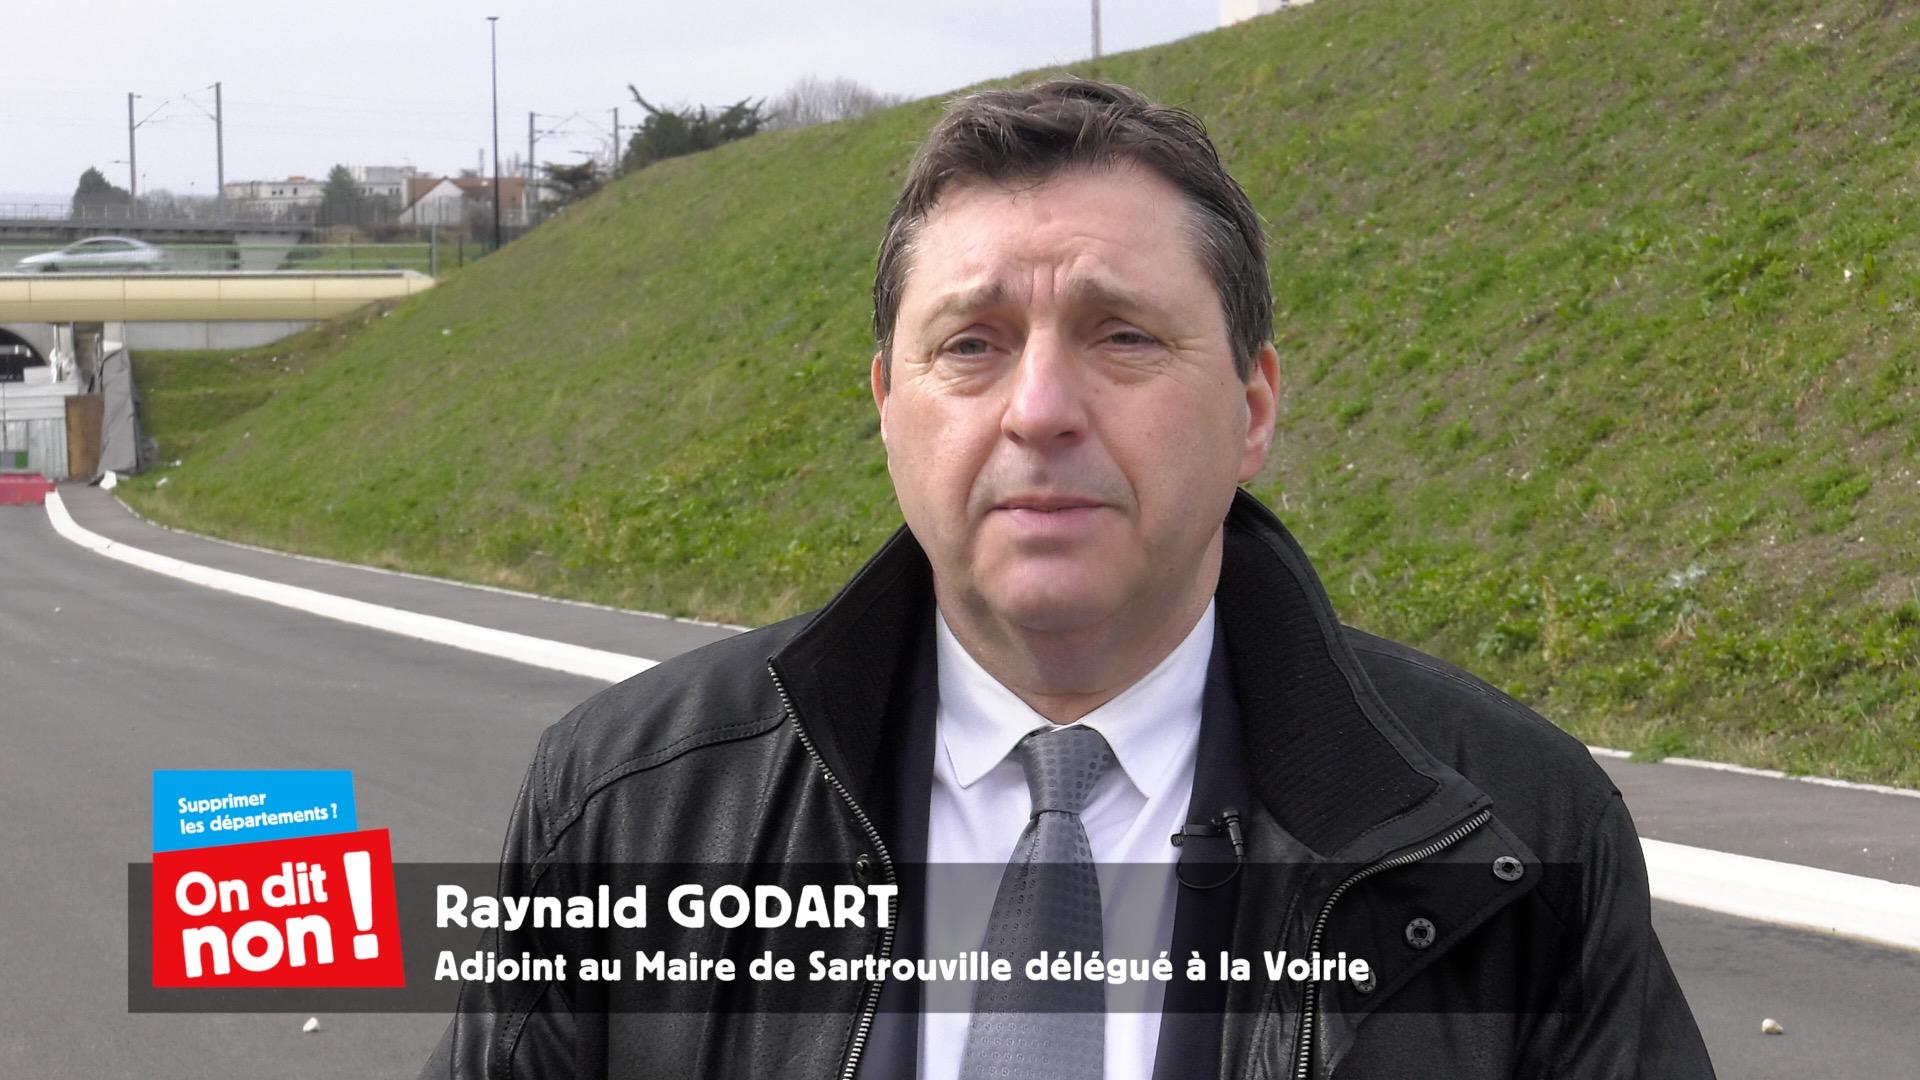 20180313_interview_raynald-godart_adjoint-voirie-sartrouville_vignette